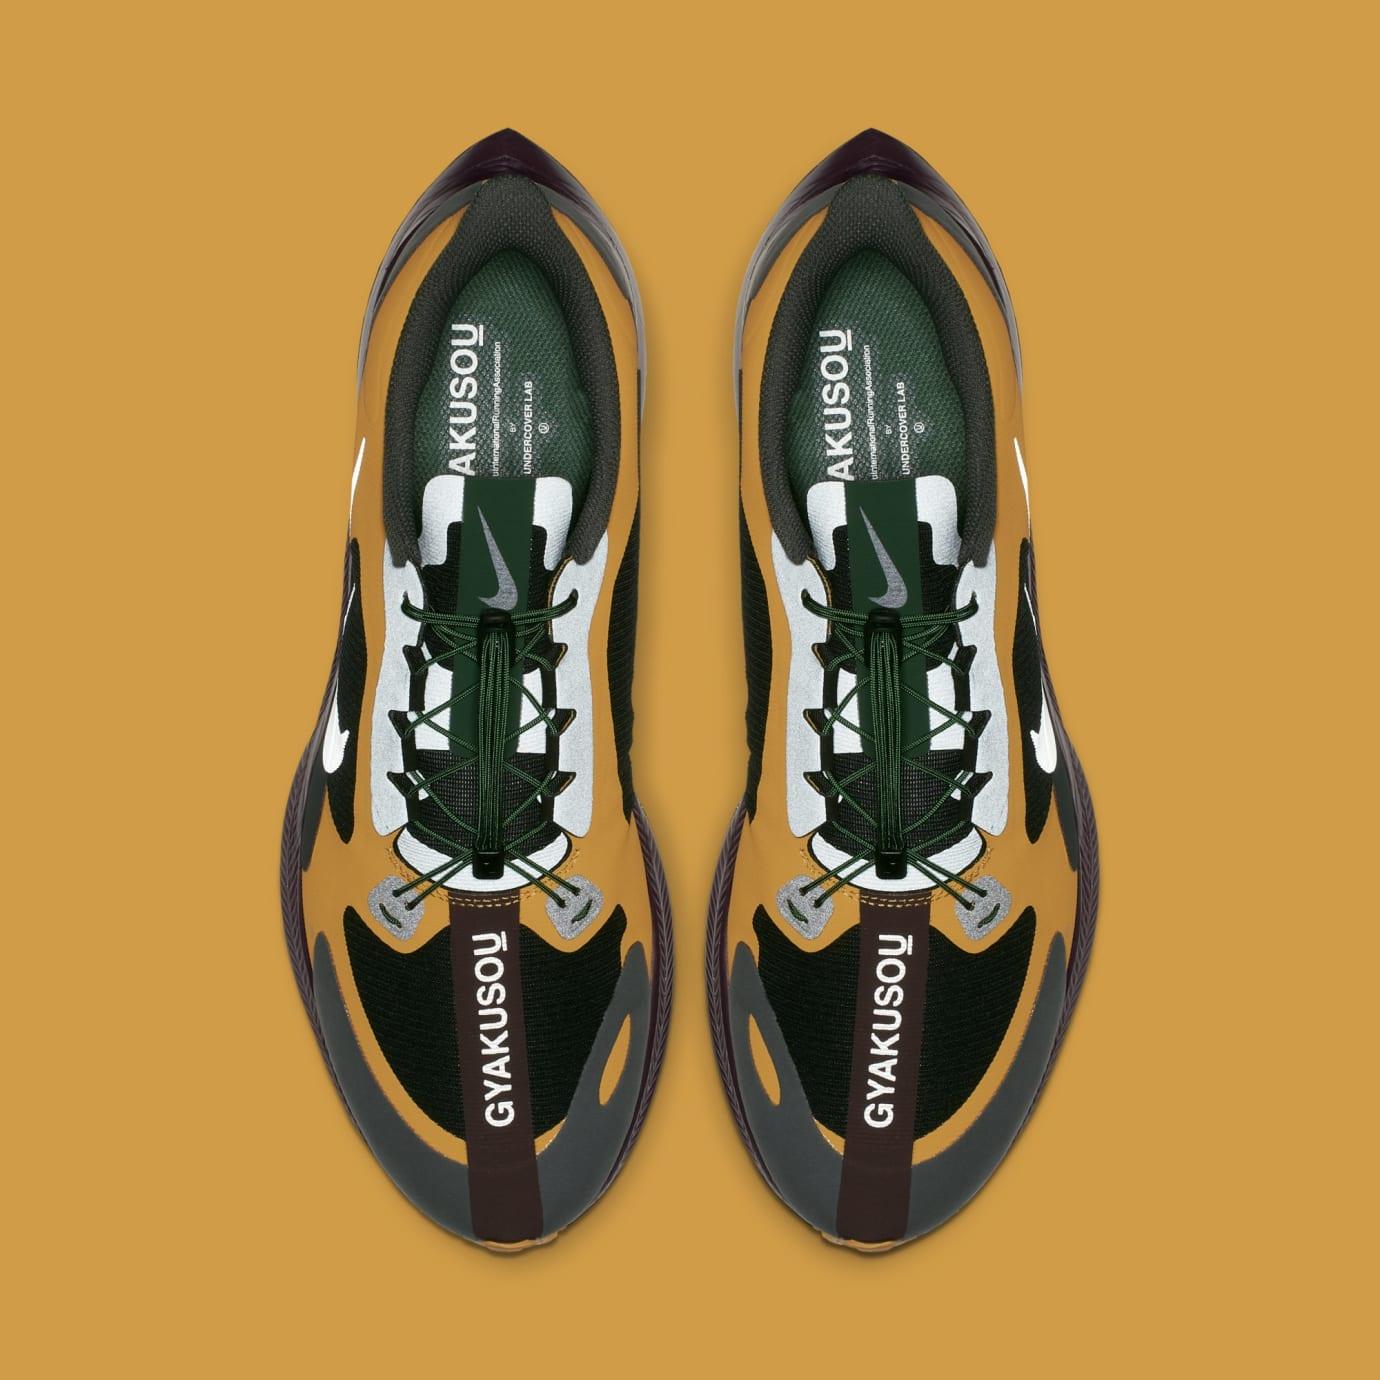 Undercover Gyakusou x Nike Zoom Pegasus Turbo BQ0579-700 (Top)